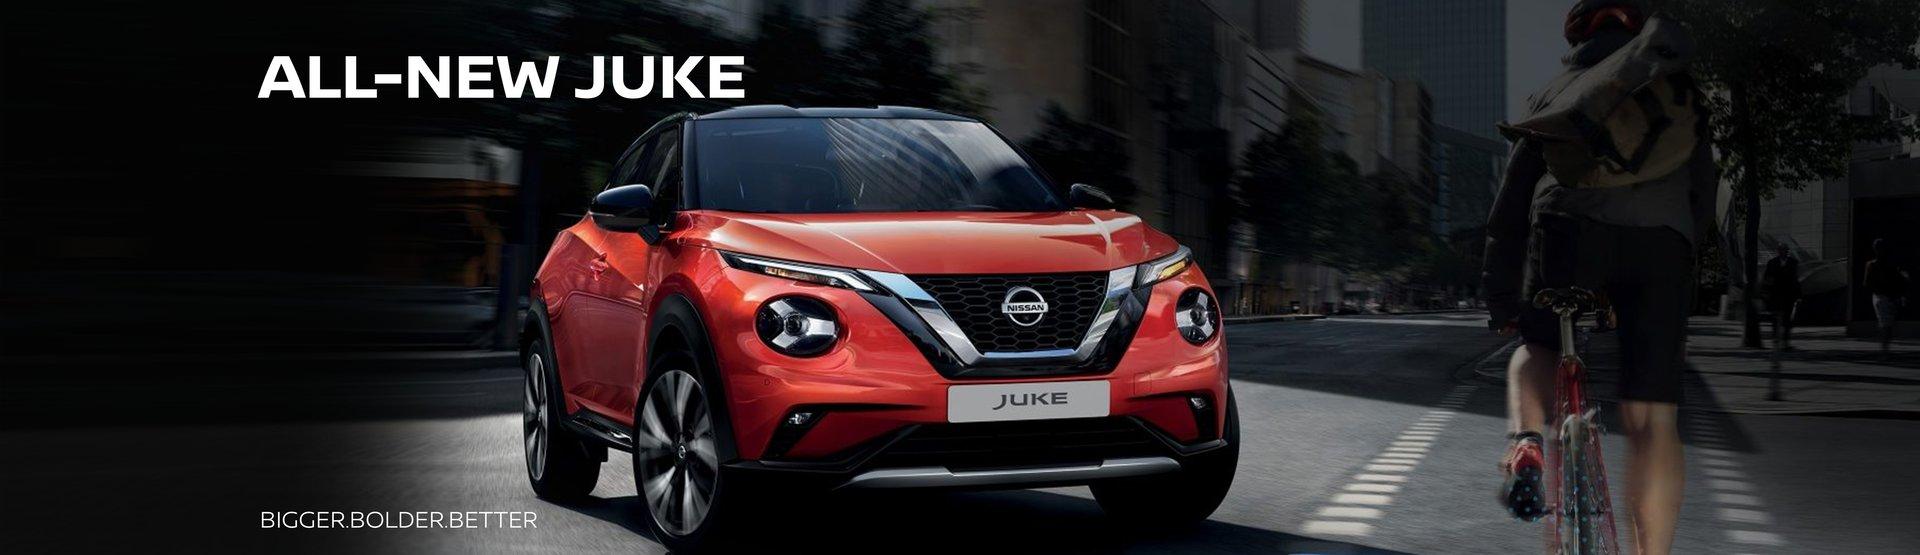 CKD Nissan Chatswood l New Juke